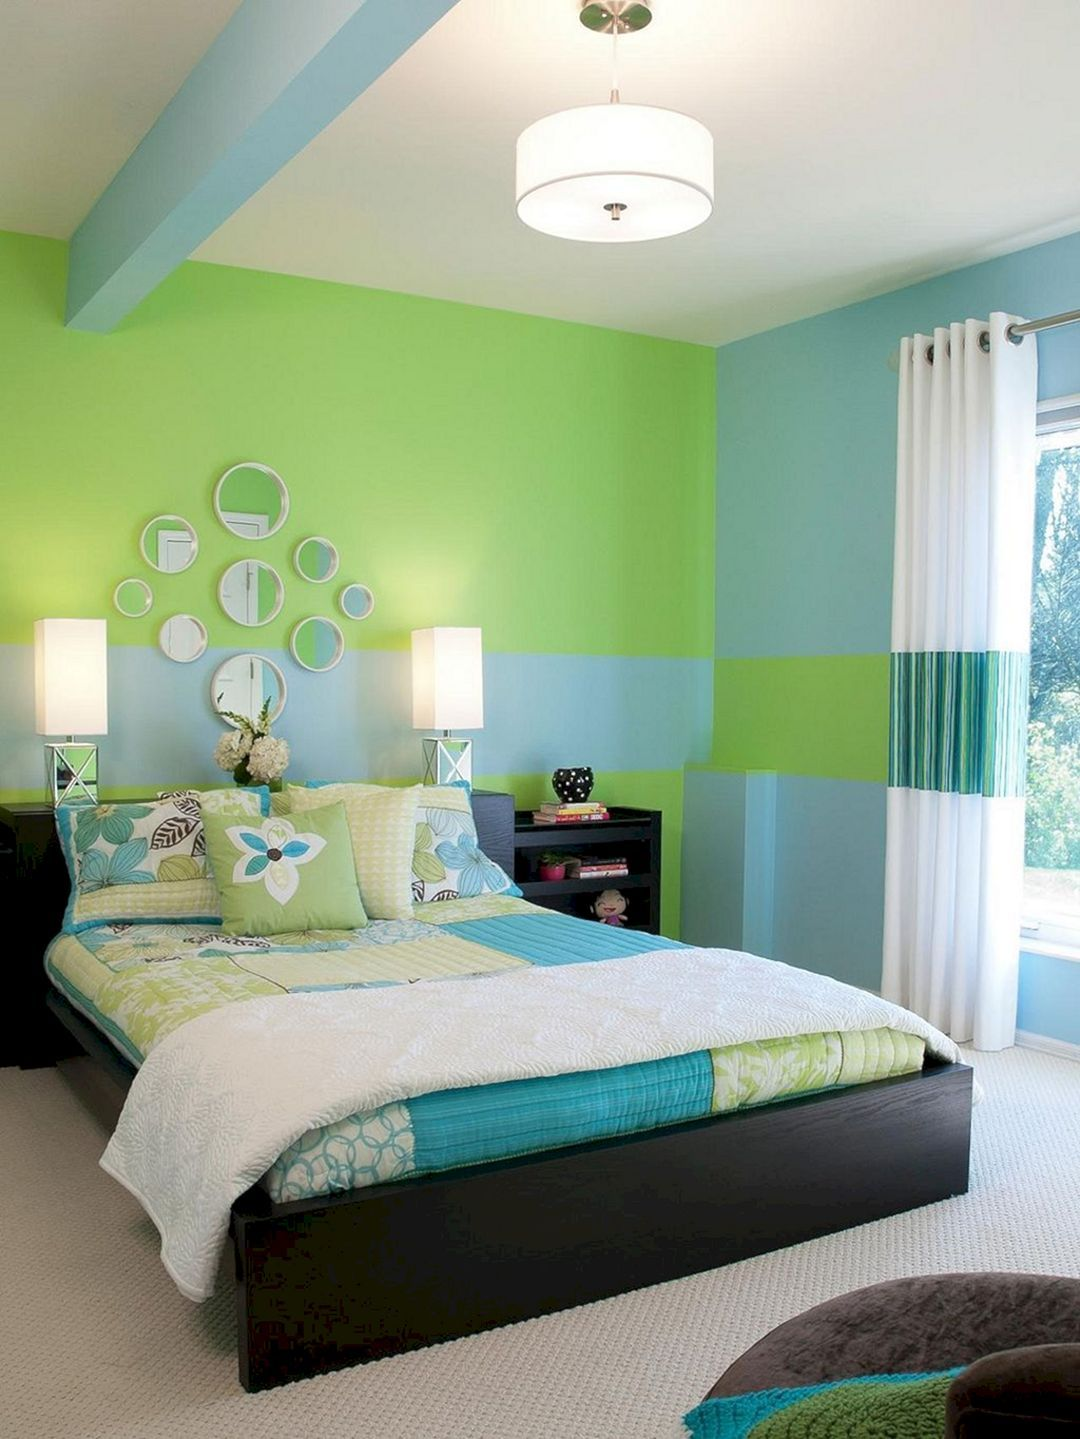 Stunning Modern Bedroom Color Scheme Ideas 40 Best Pictures Freshouz Com Green Bedroom Decor Unique Bedroom Design Simple Room Decoration